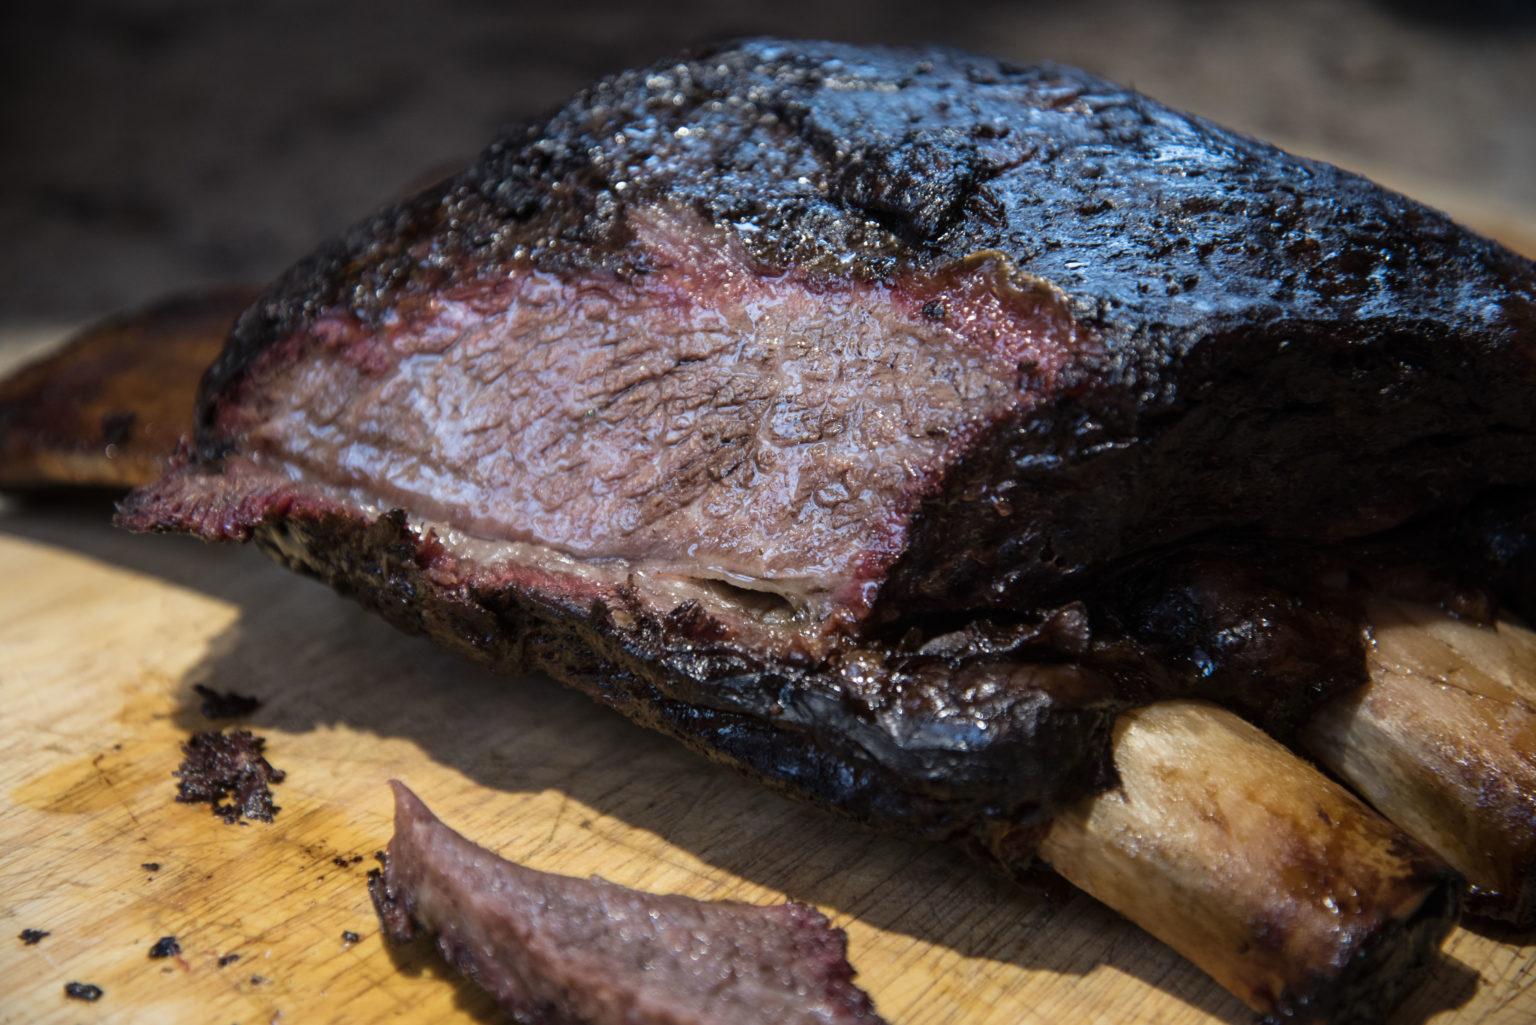 BARBECUE AMERICANO: BEEF RIBS